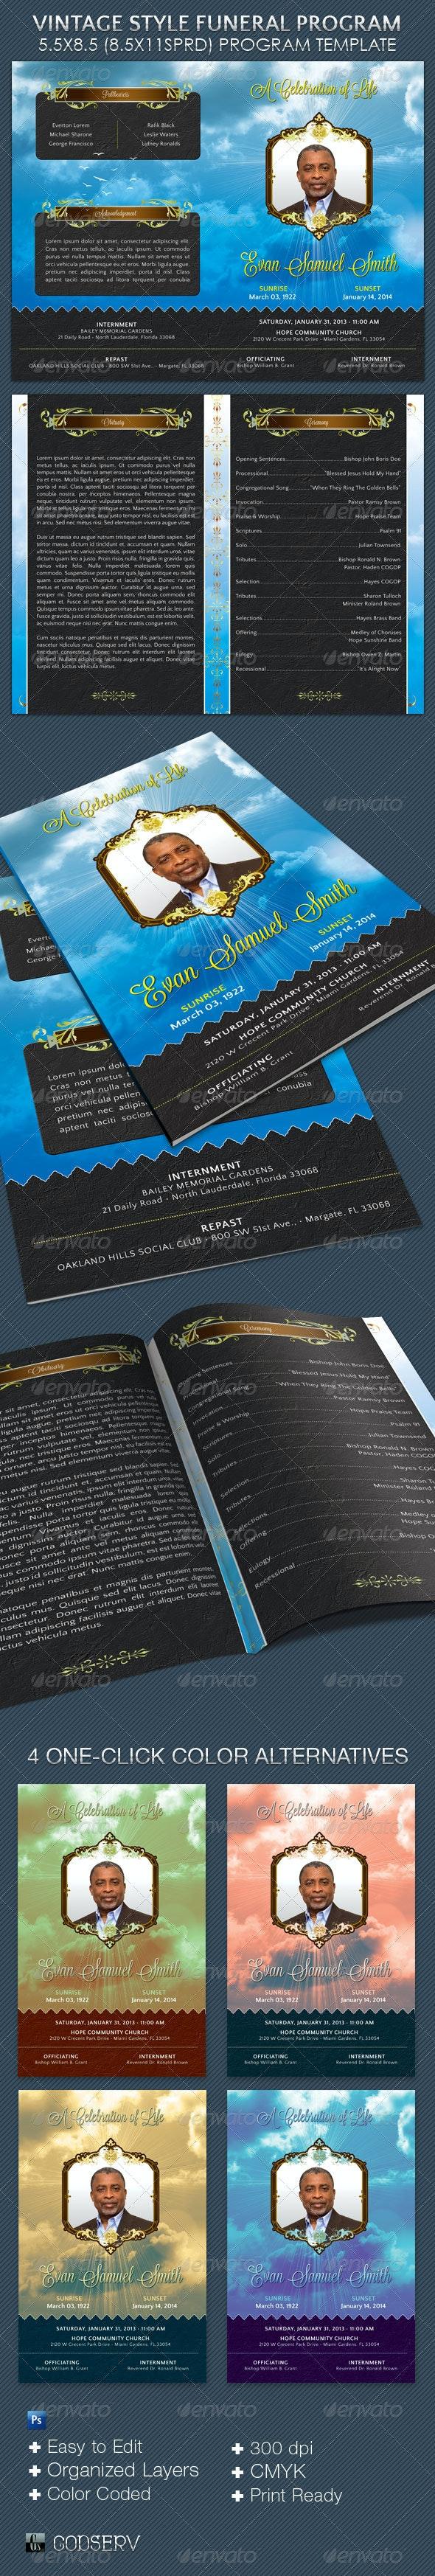 Vintage Style Funeral Program Template - Informational Brochures